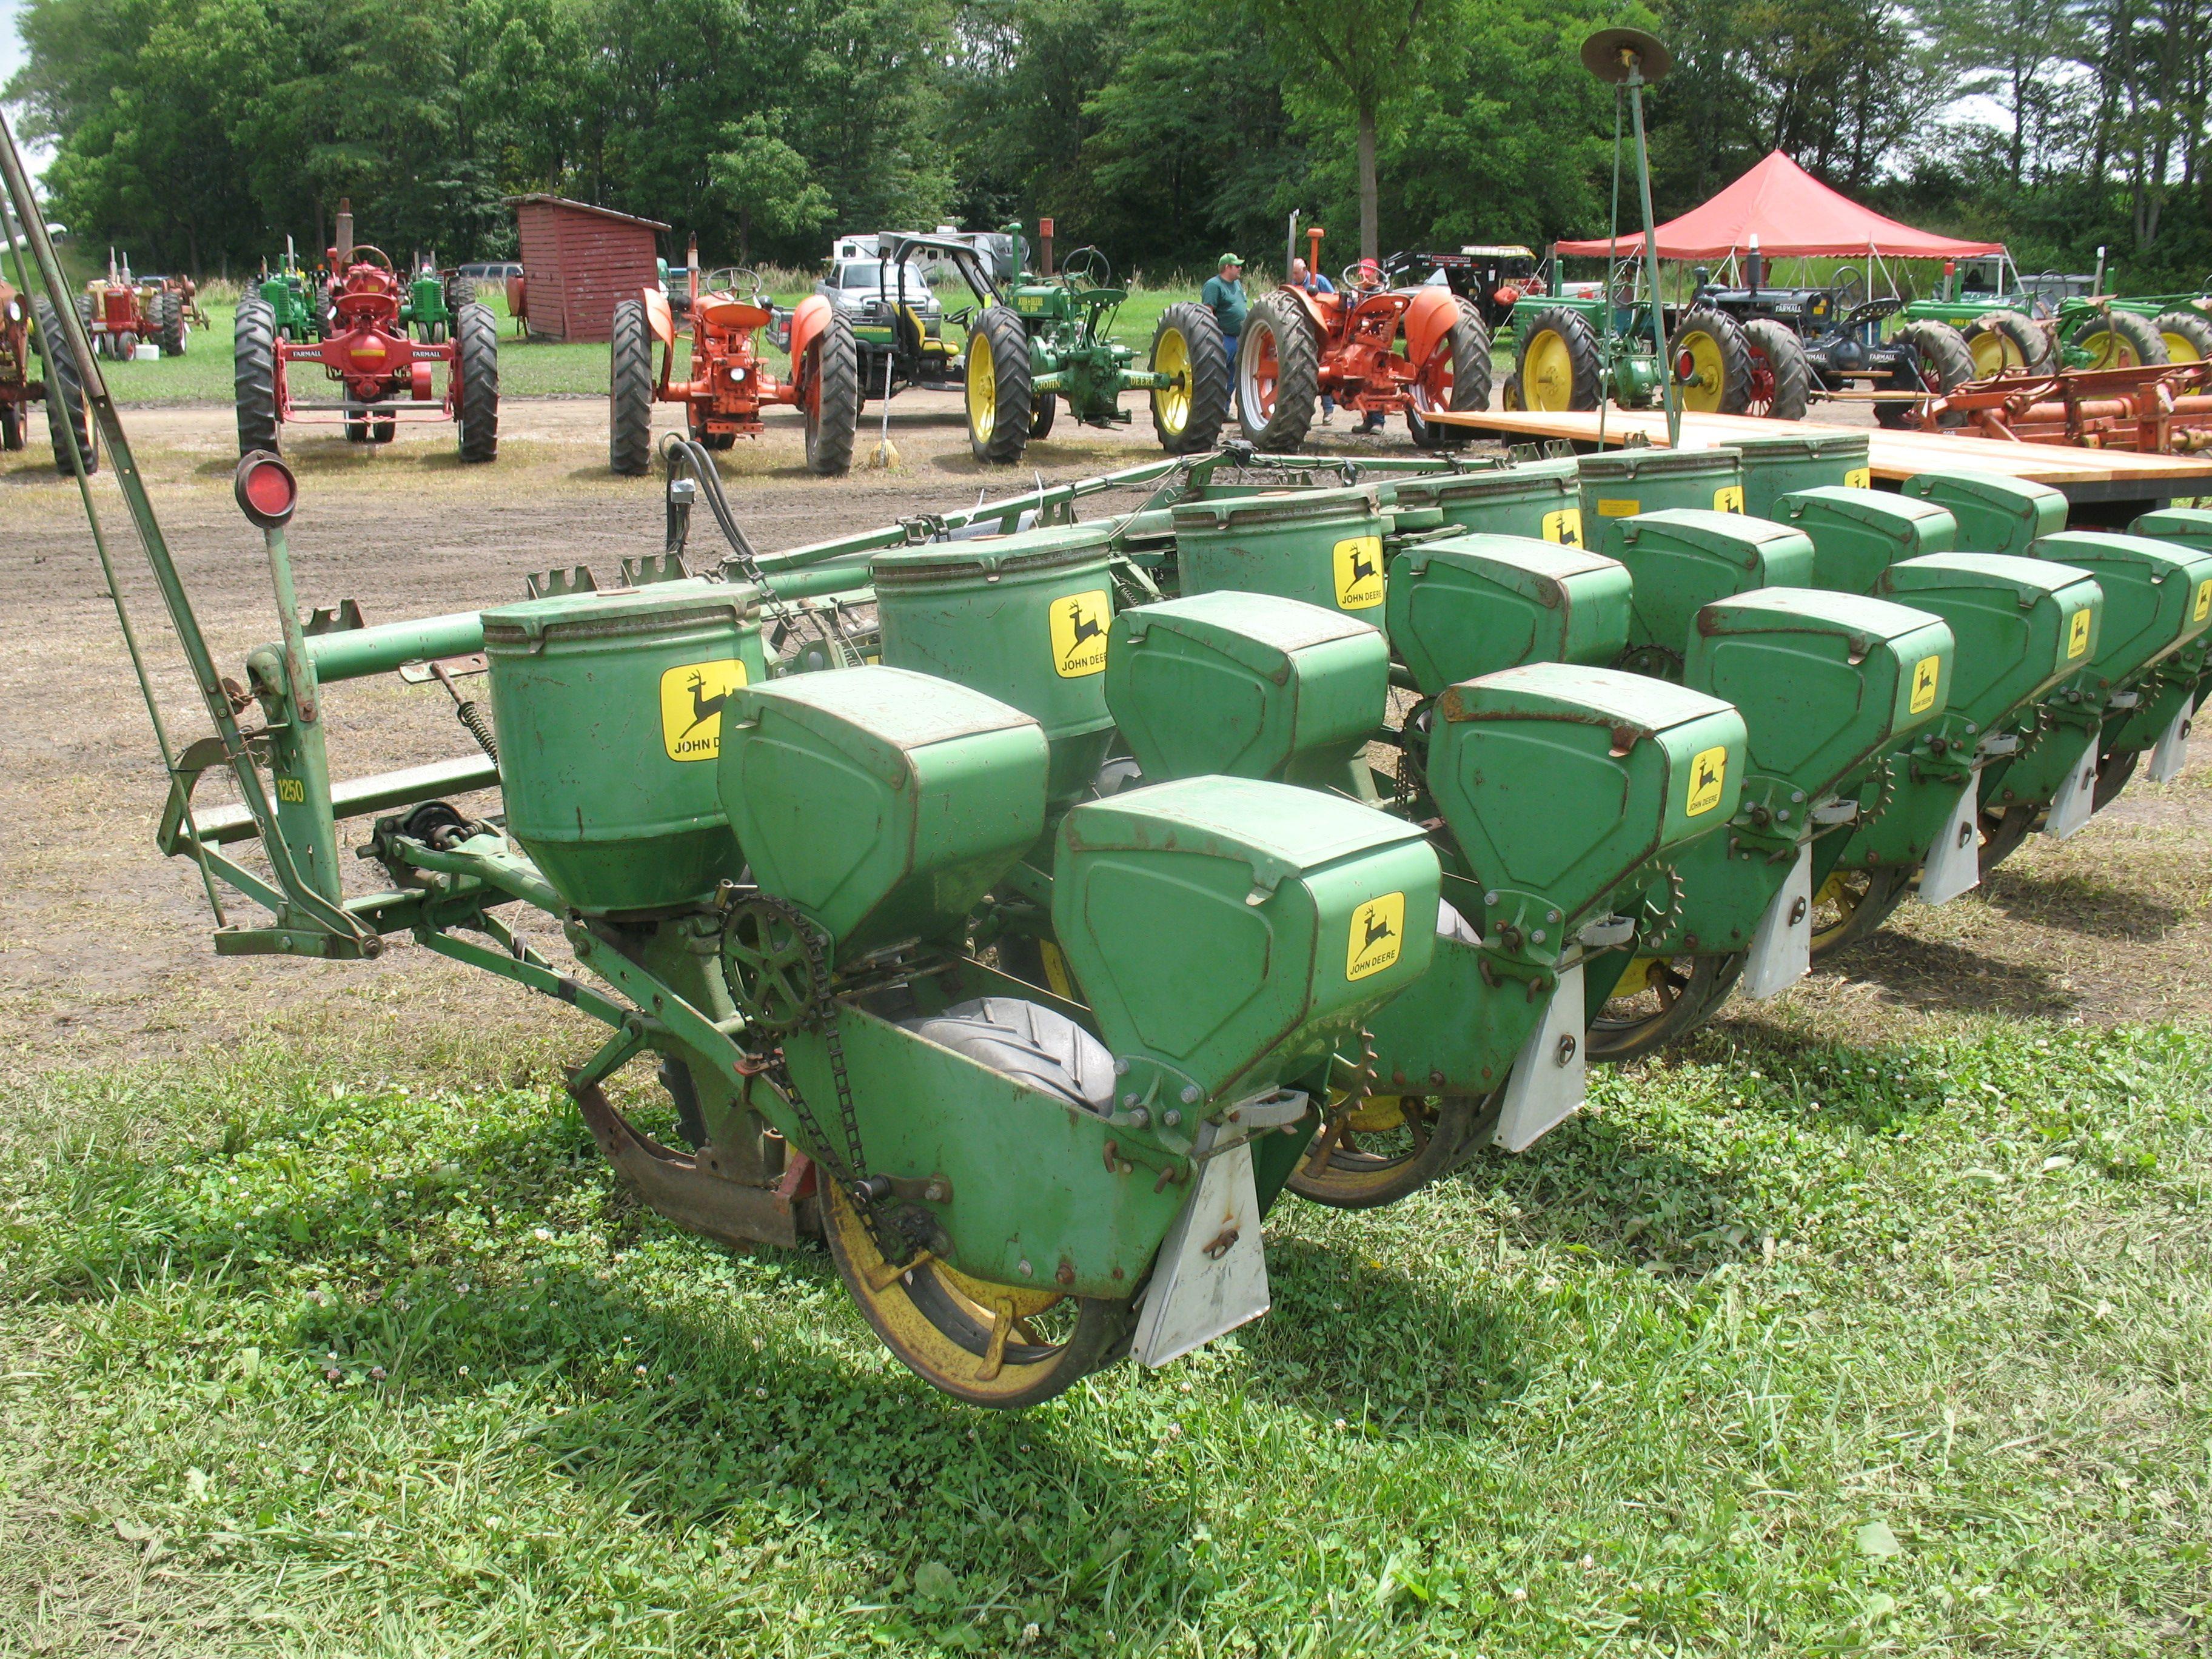 Cole planters prices - Vintage John Deere 6 Row Seed Planter